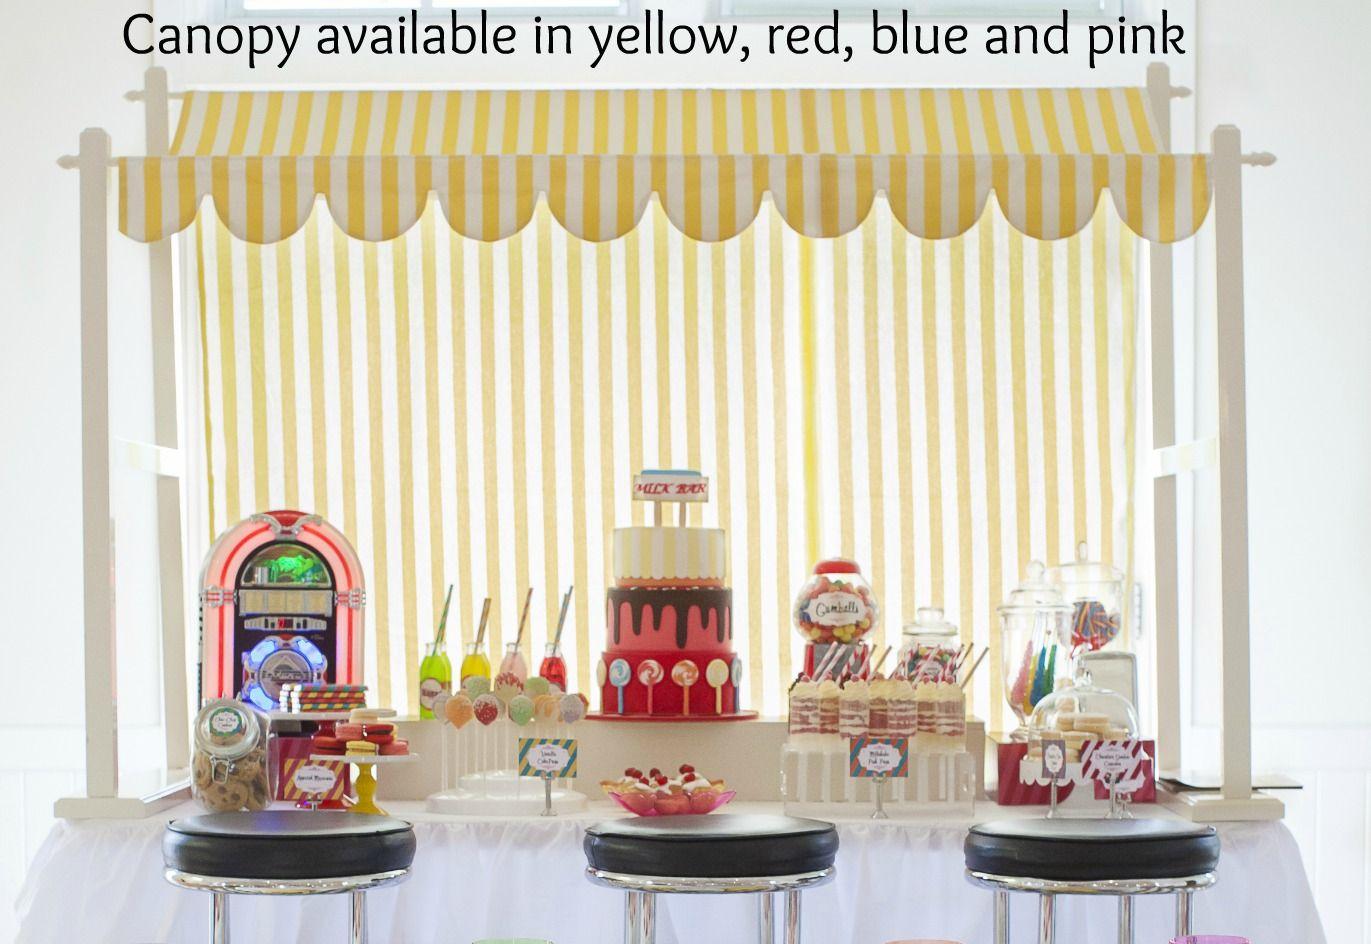 Yellow Lolly Shop Canopy Display Retro Milk Bar theme .tinytotstoyhire.com.au & Yellow Lolly Shop Canopy Display Retro Milk Bar theme www ...